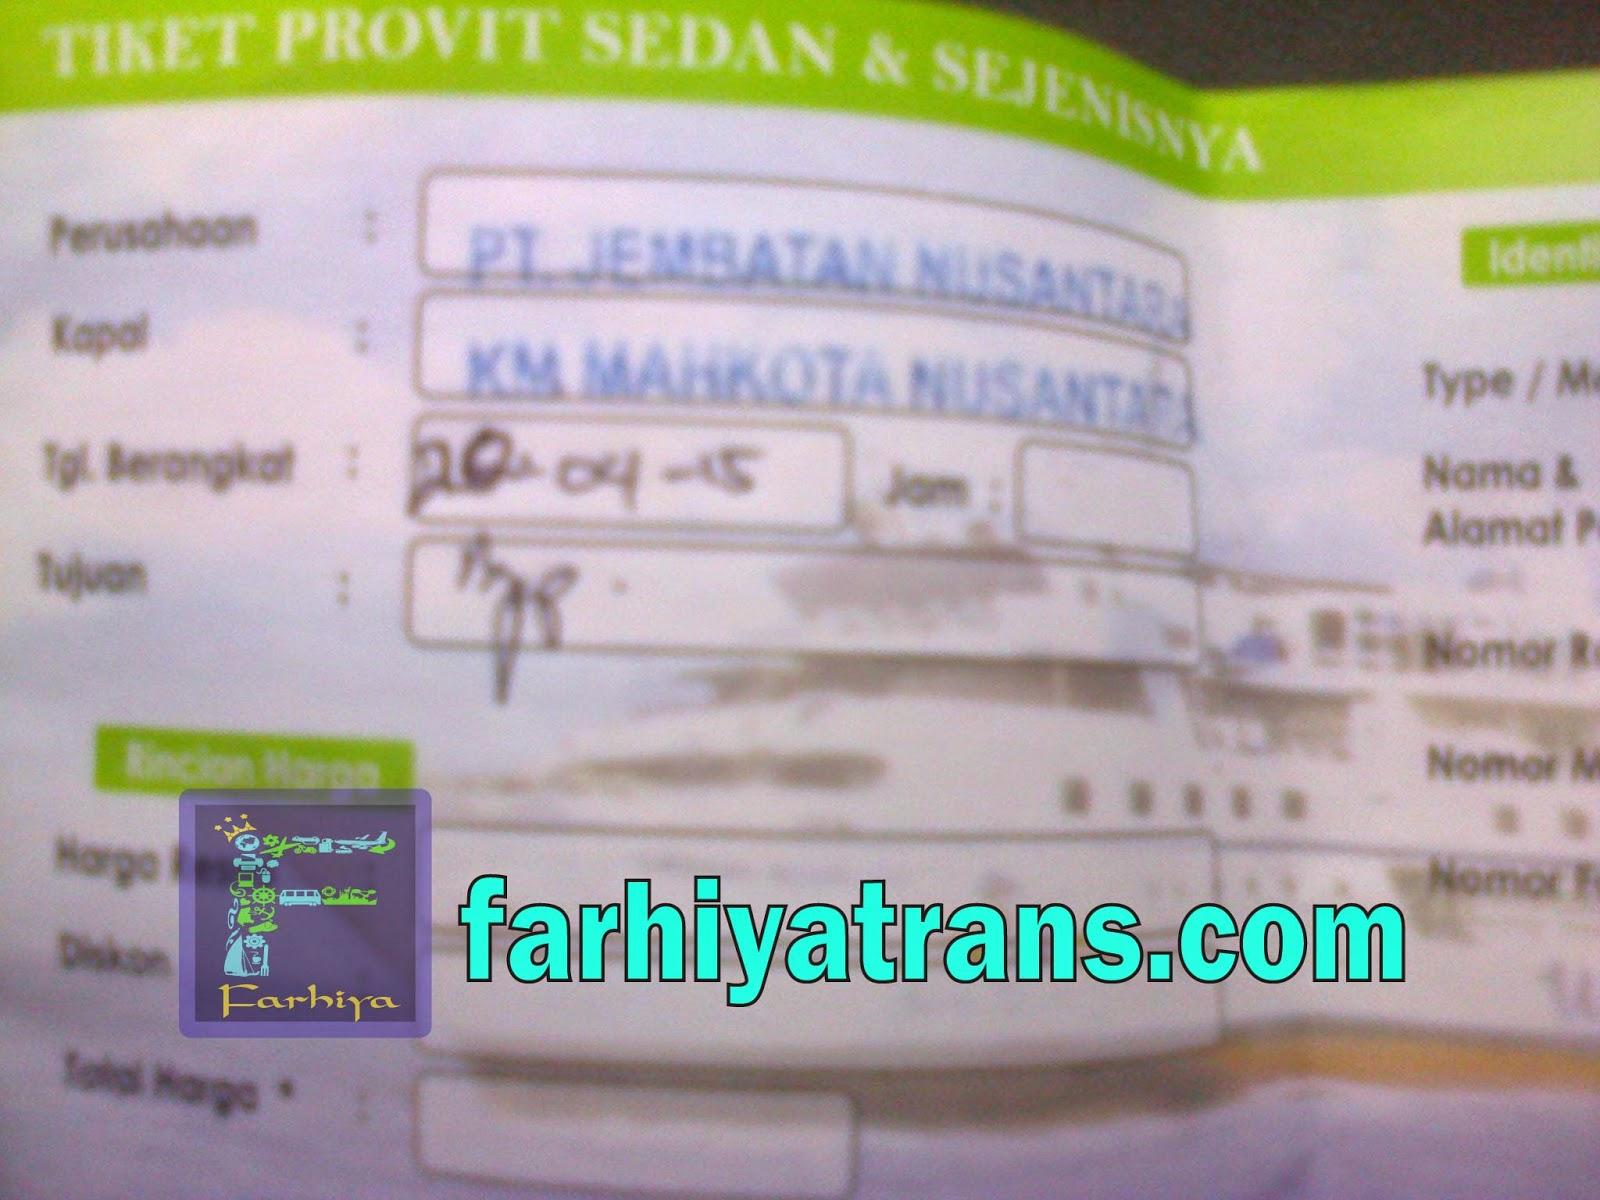 tiket pengiriman kendaraan surabaya